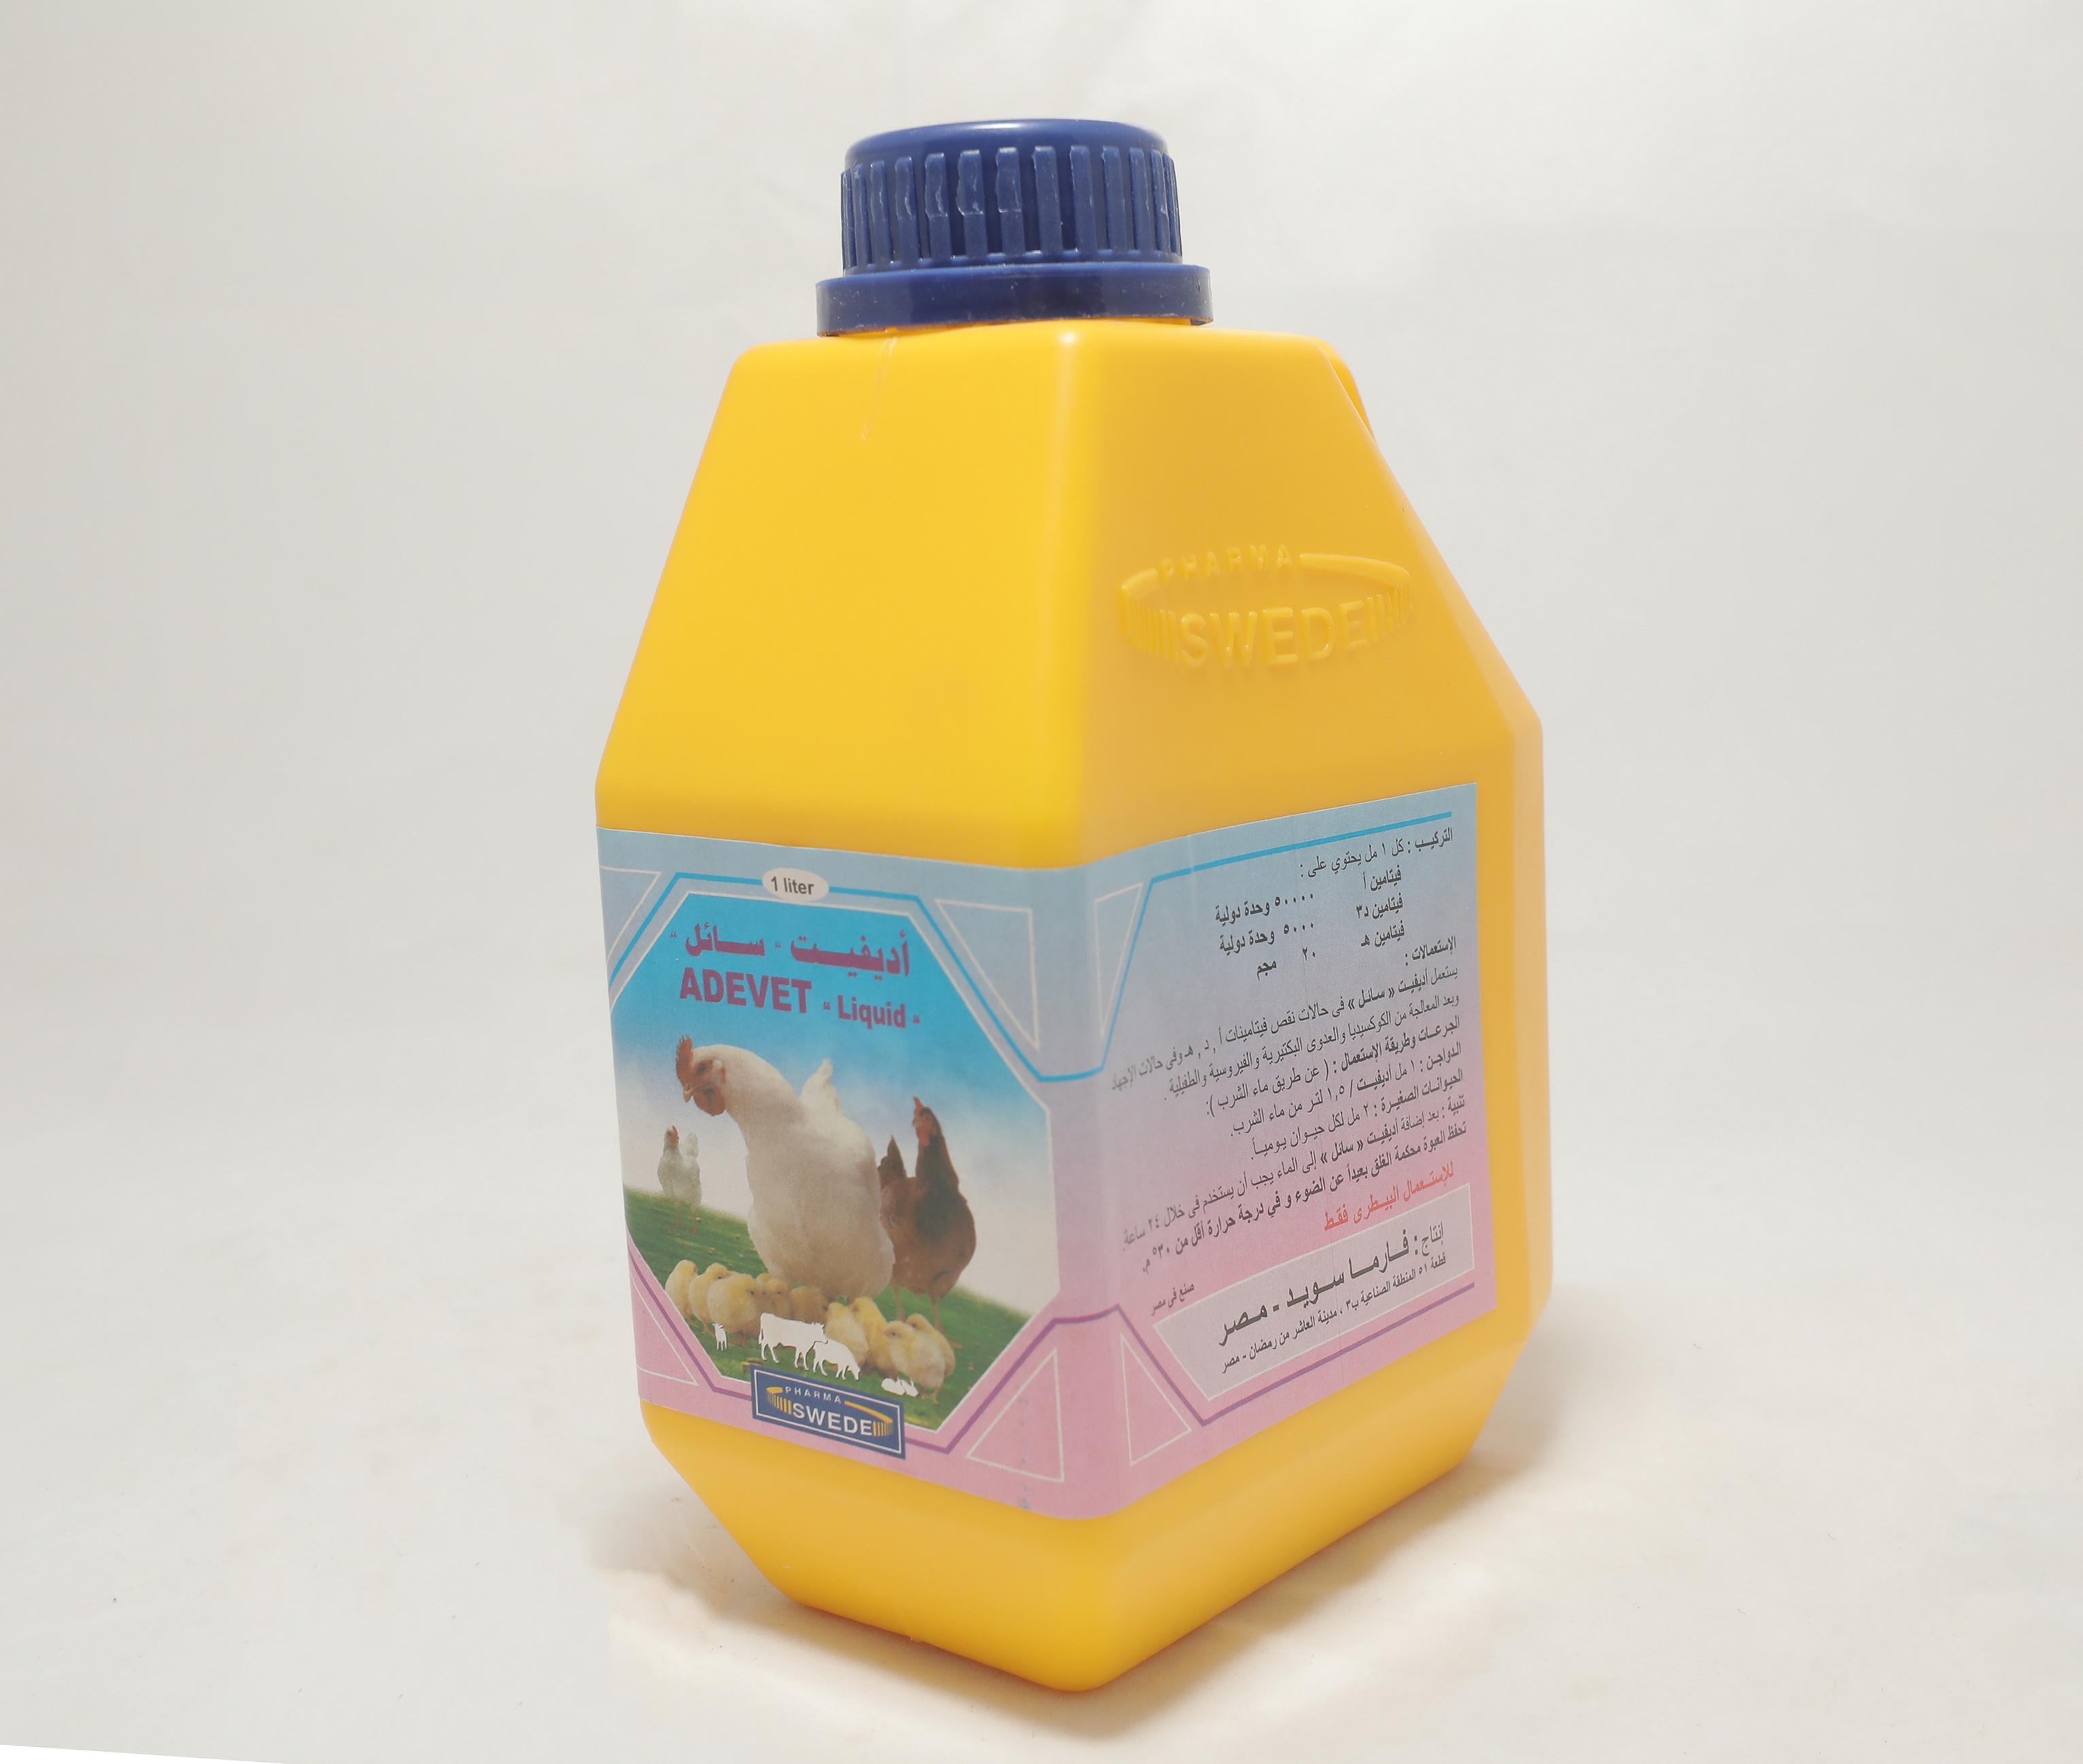 Adevet liquid